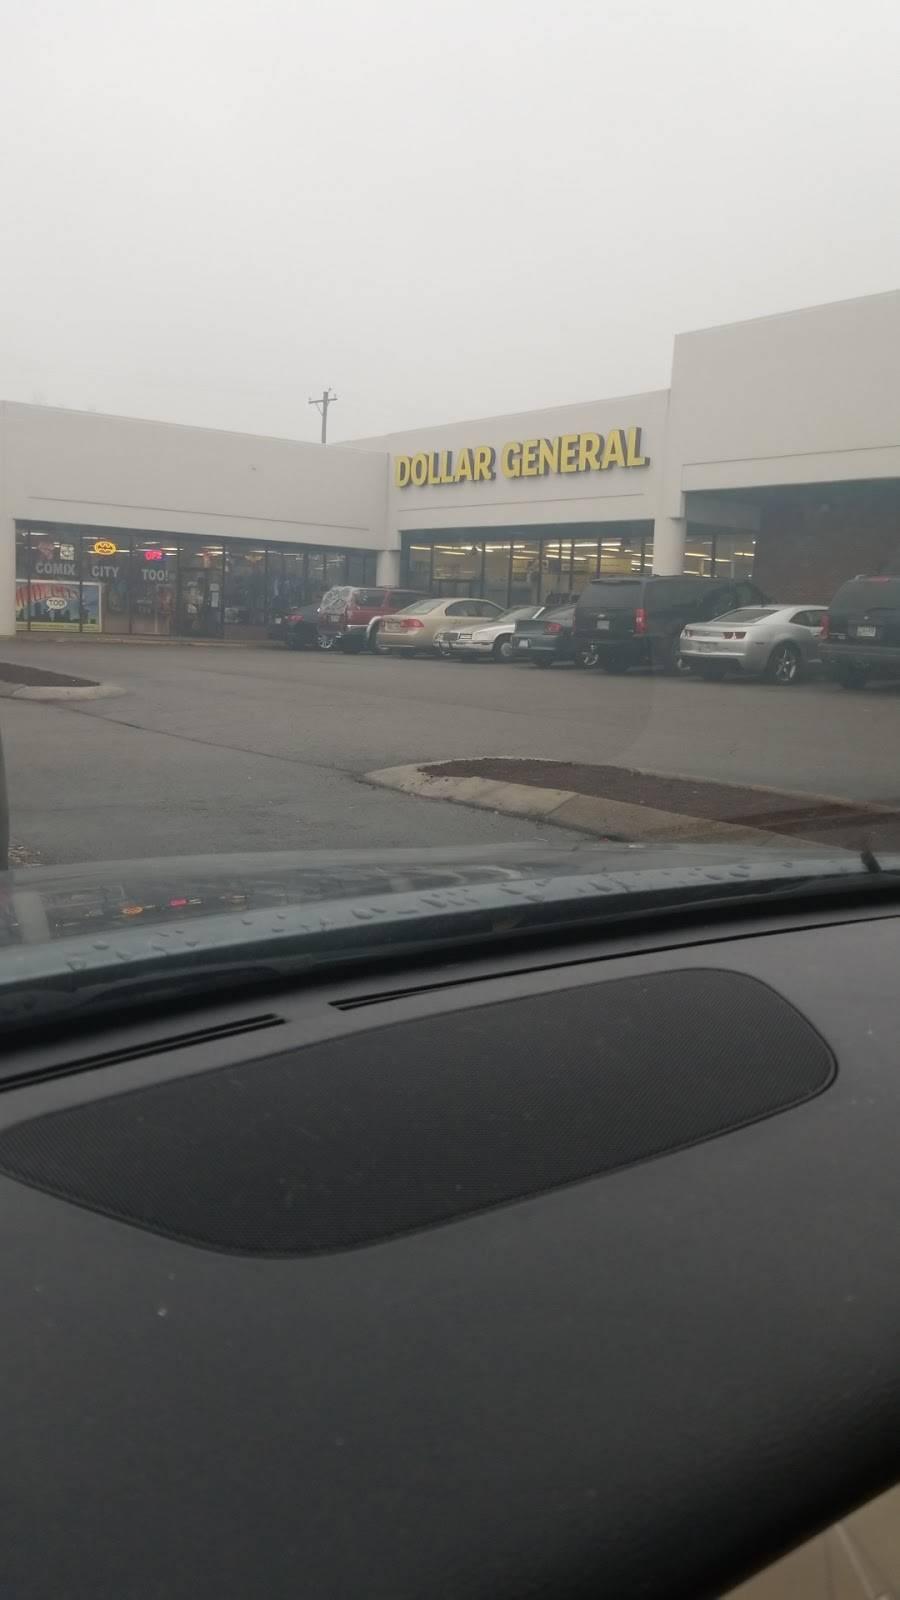 Dollar General - home goods store  | Photo 3 of 3 | Address: 1578 Gallatin Pike N, Madison, TN 37115, USA | Phone: (423) 442-3667